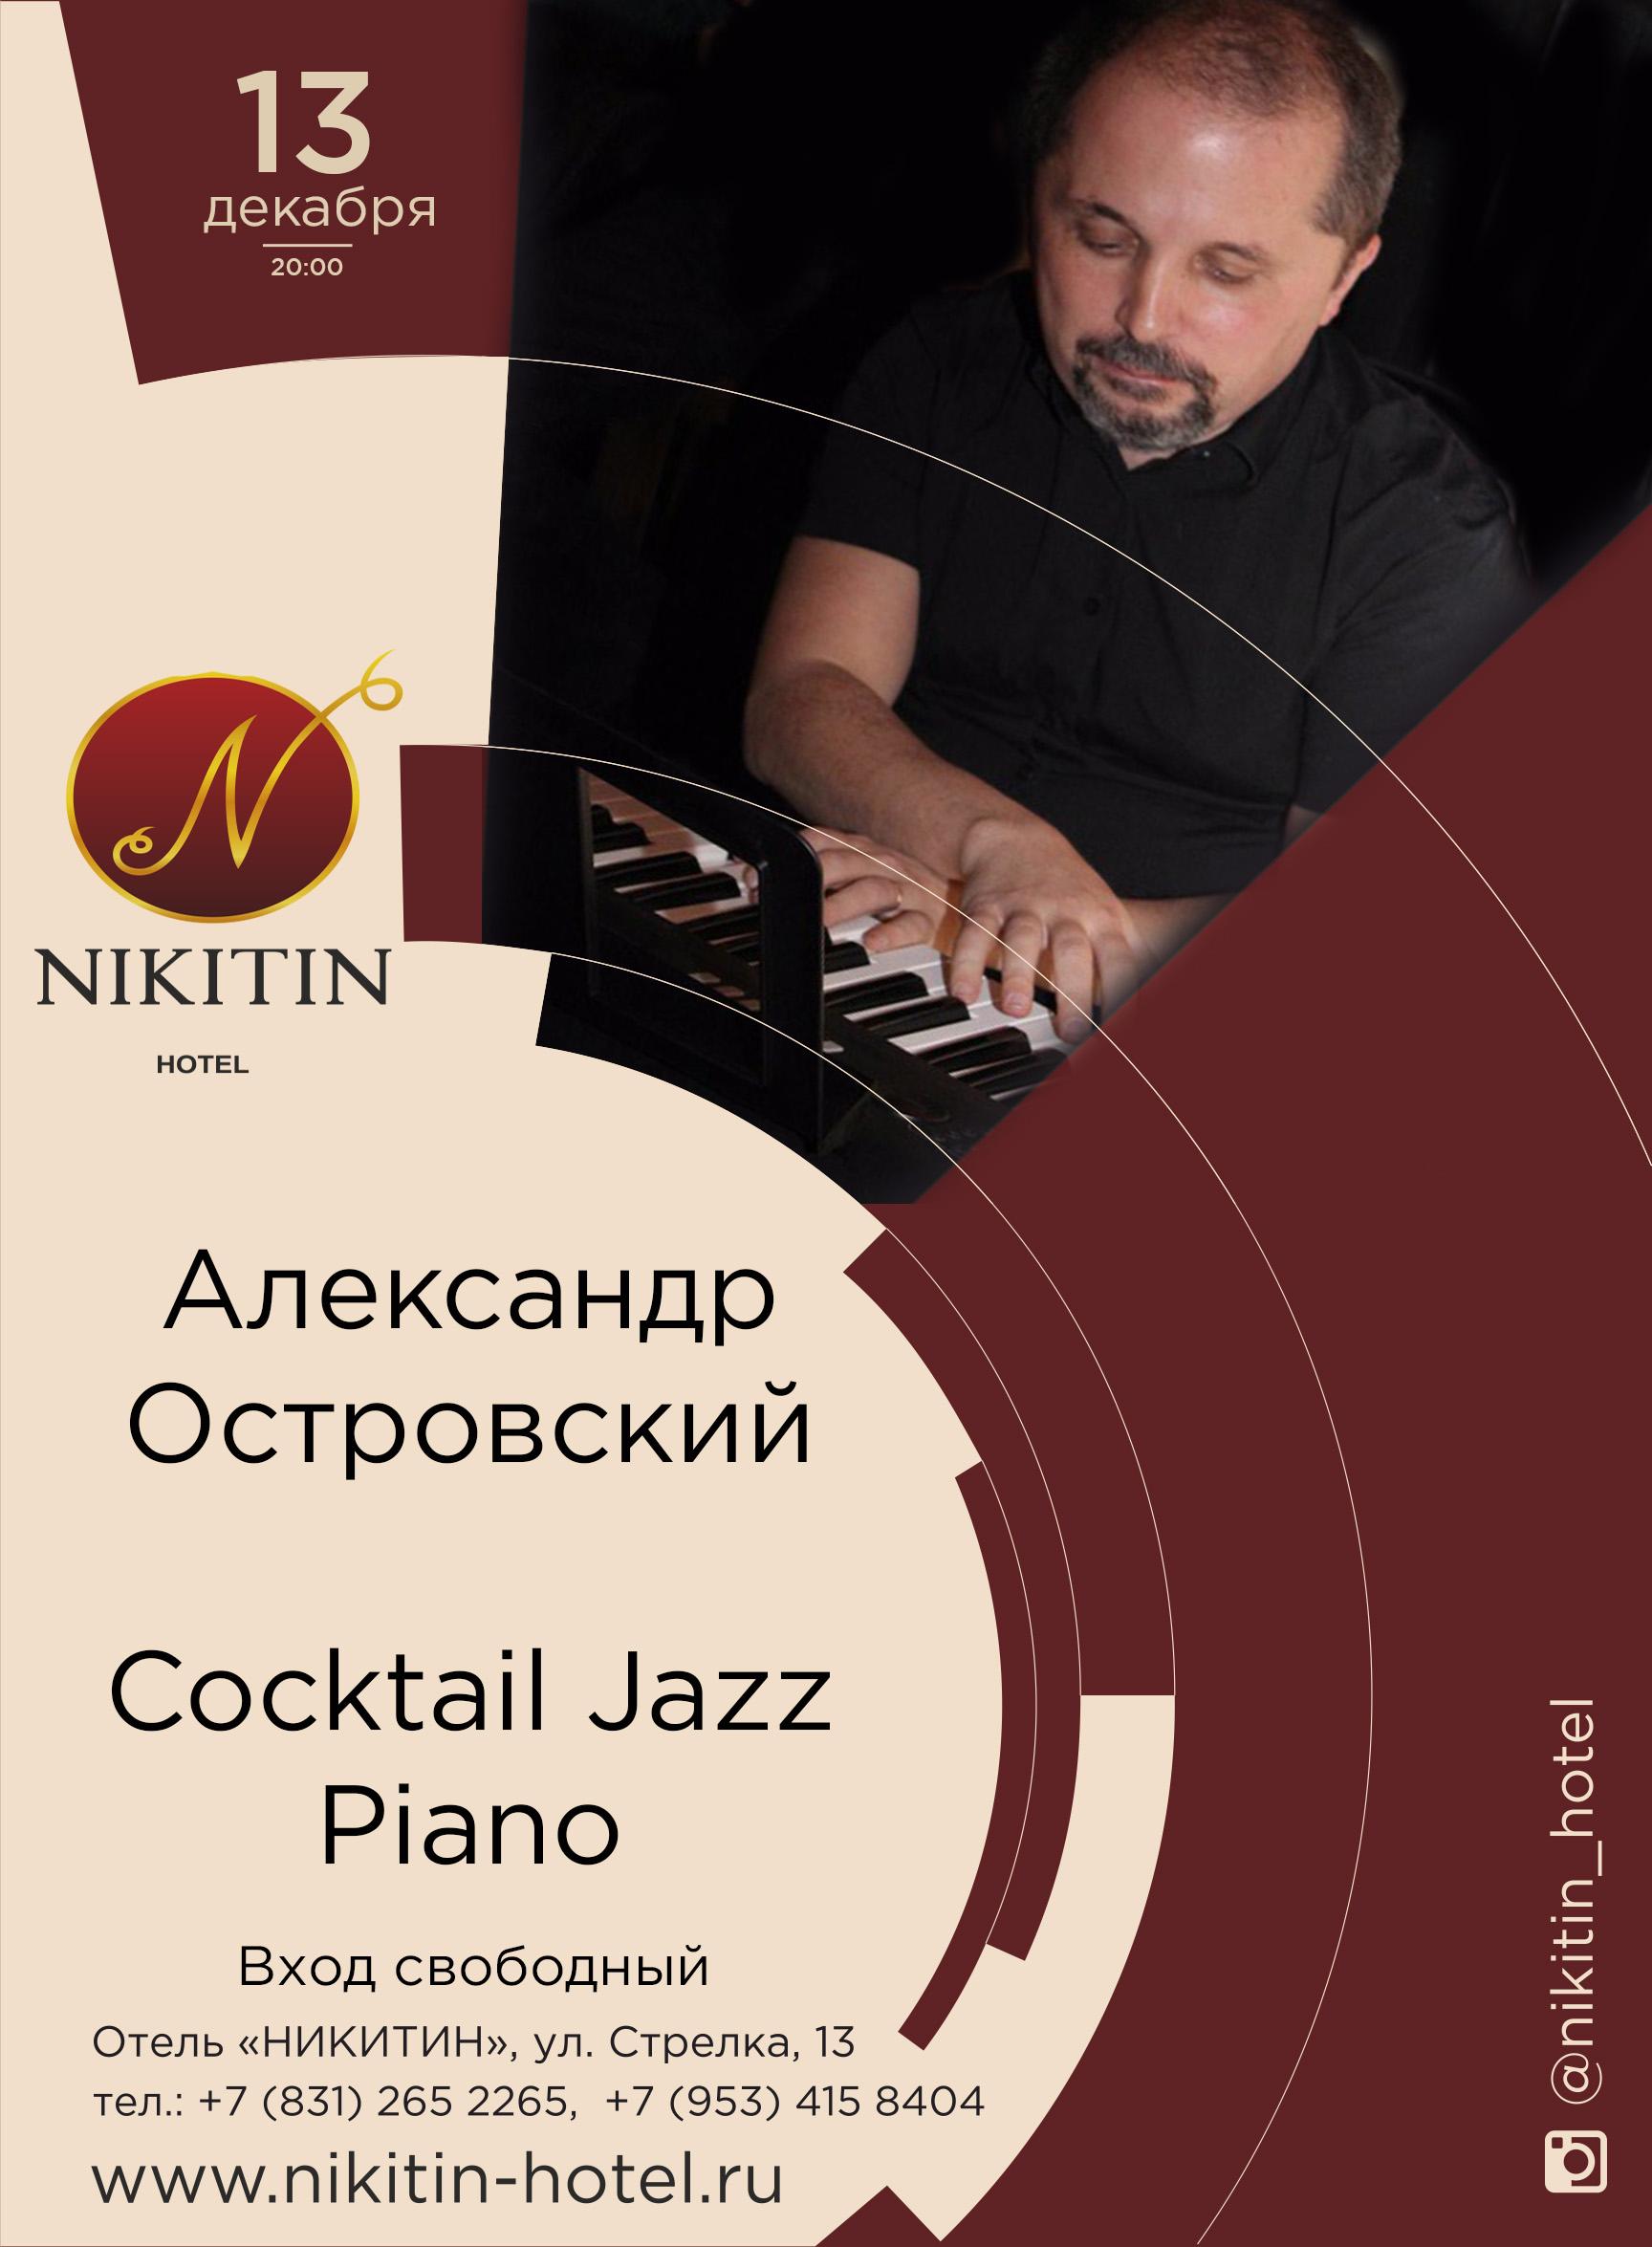 Александр Островский с программой Cocktail Jazz Piano